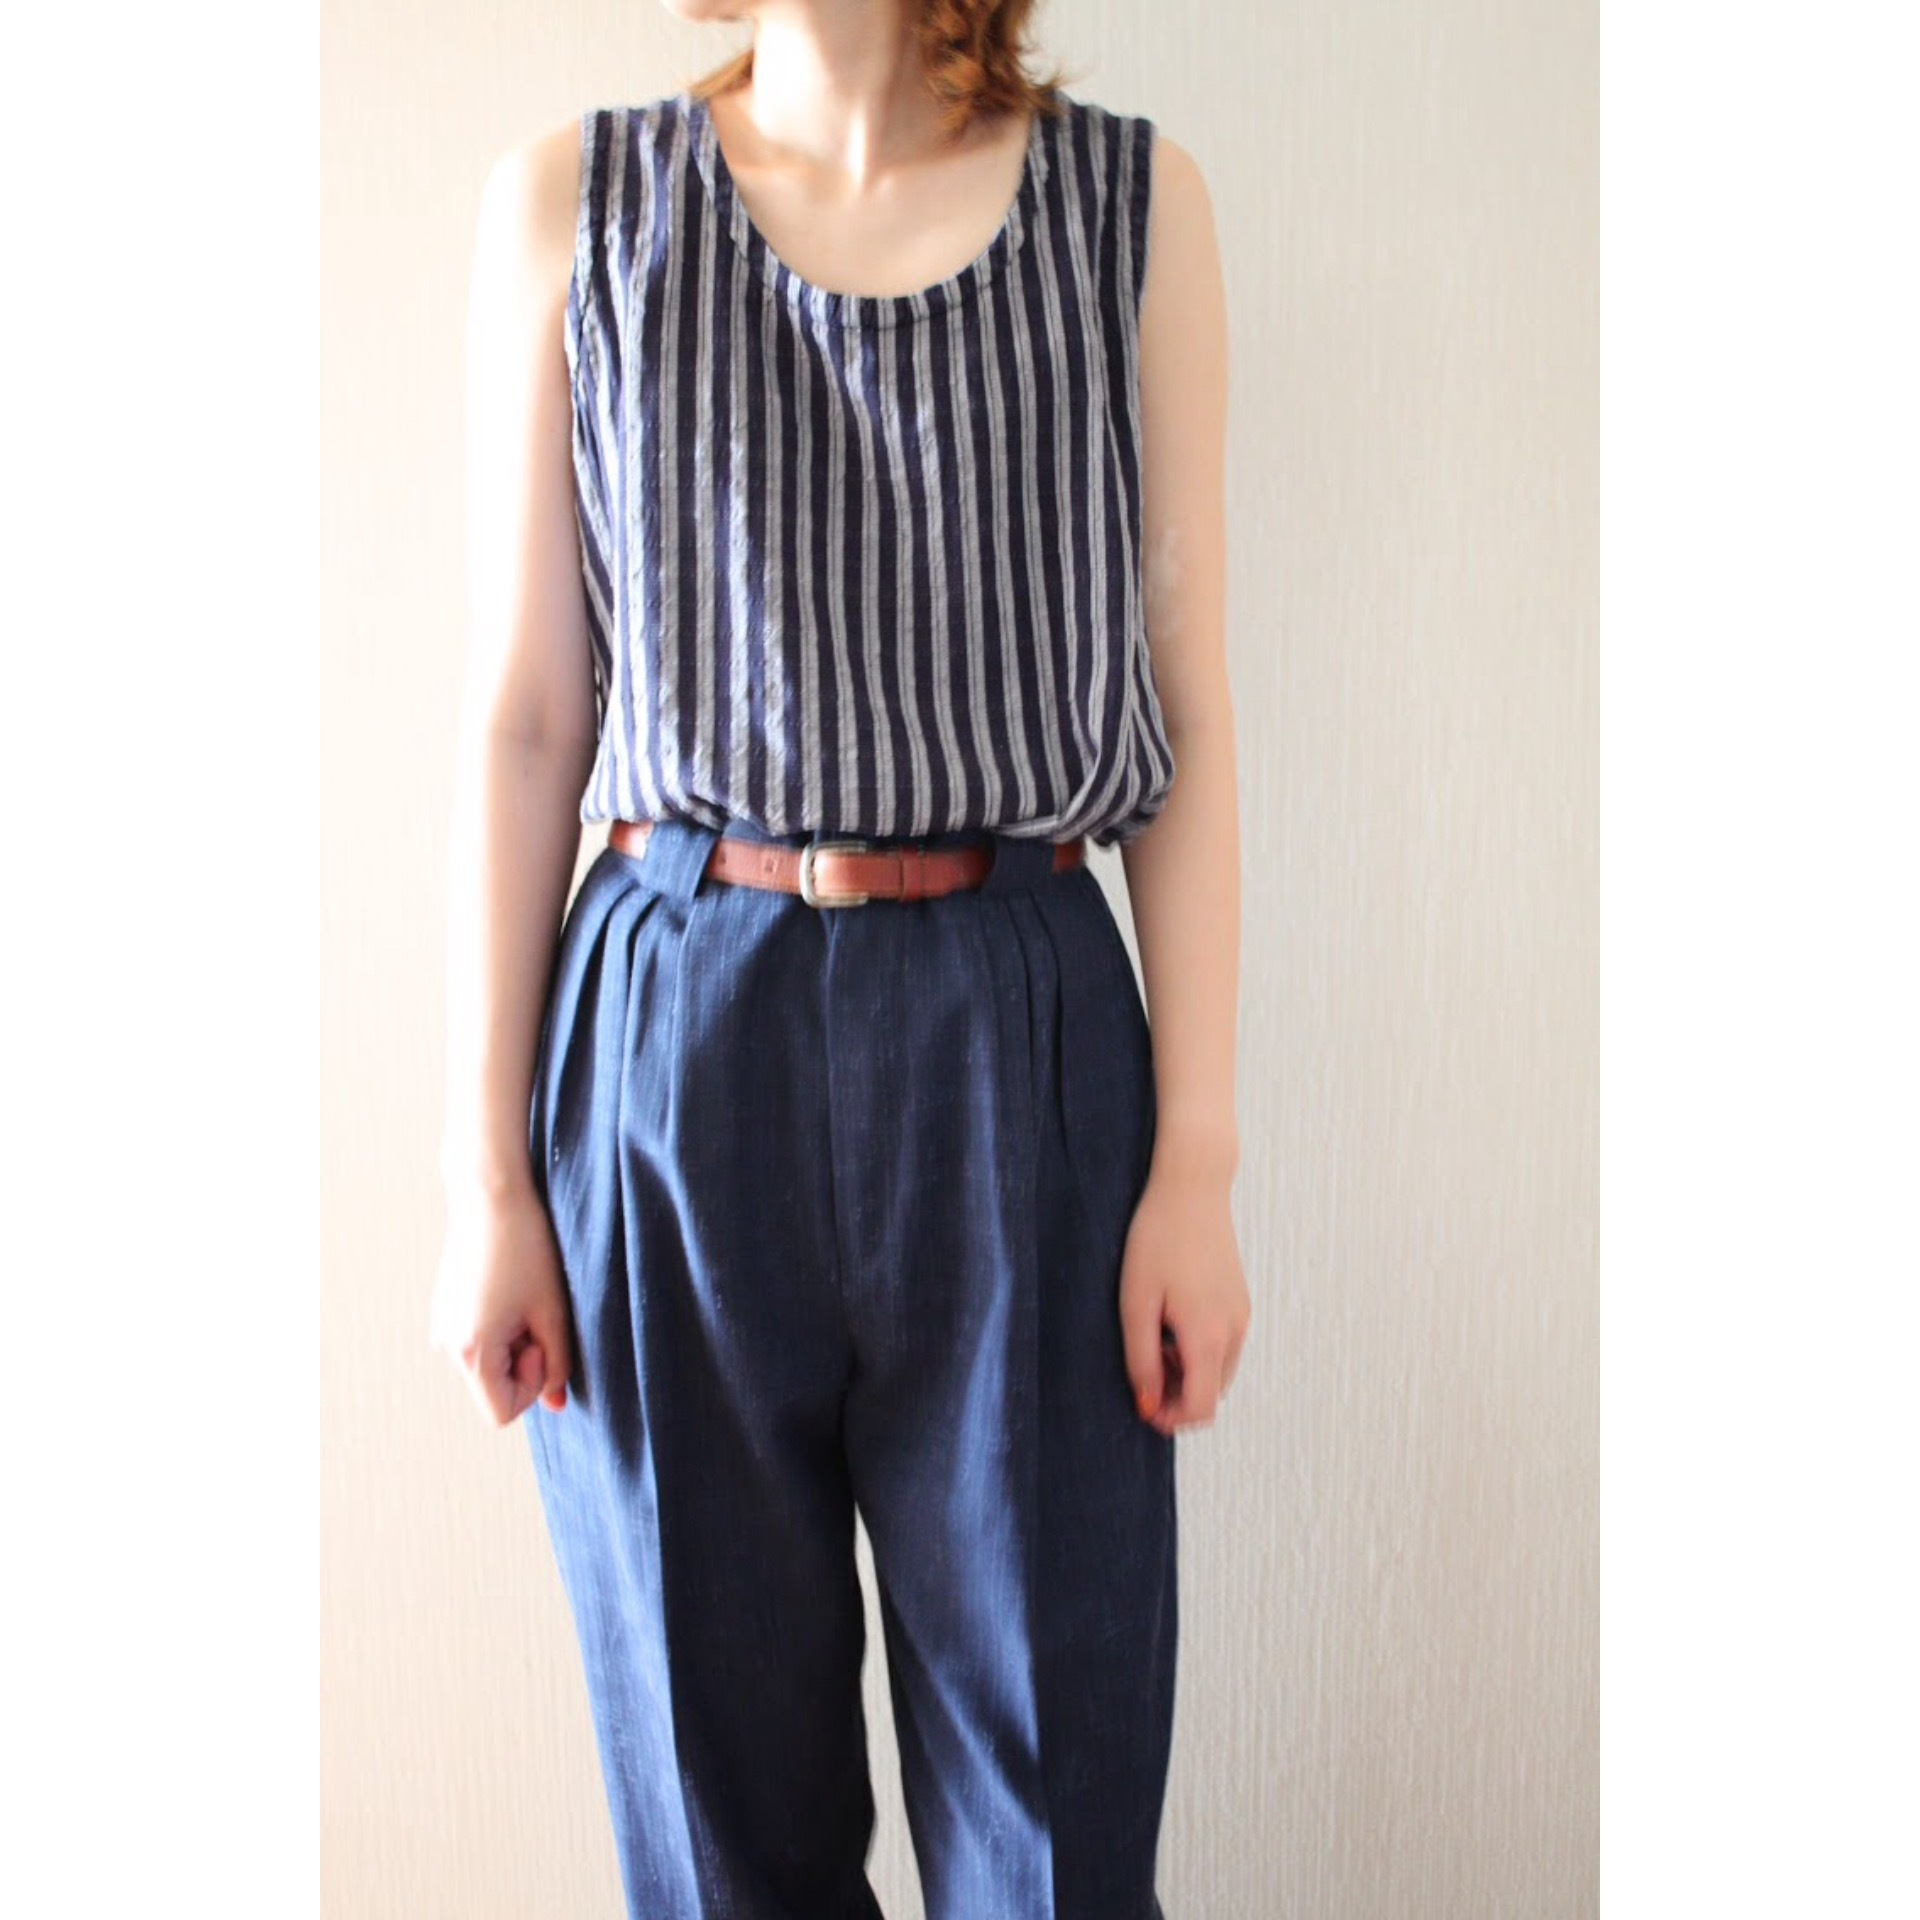 Vintage stripe tops